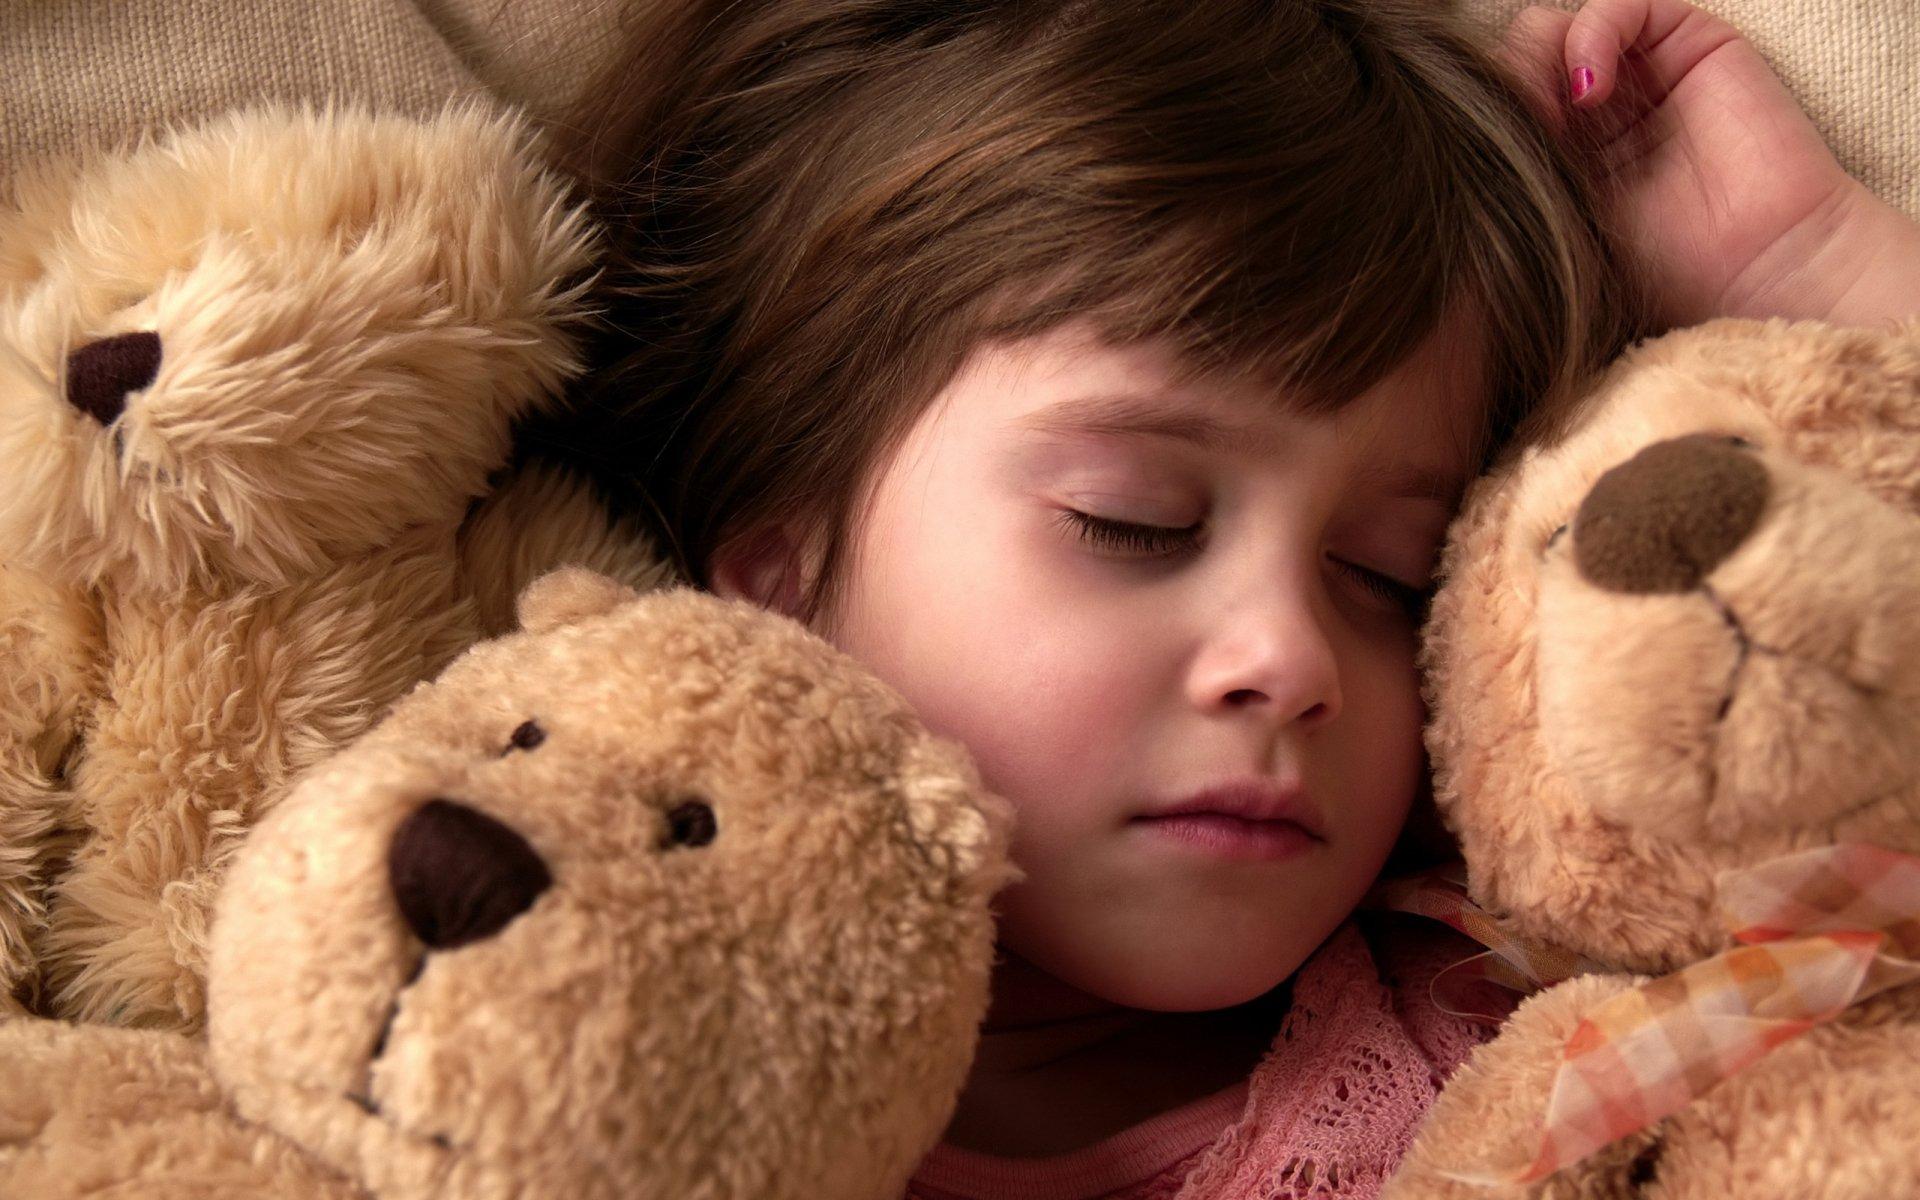 Minnesota) 10 Children File Class Action Lawsuit After Child